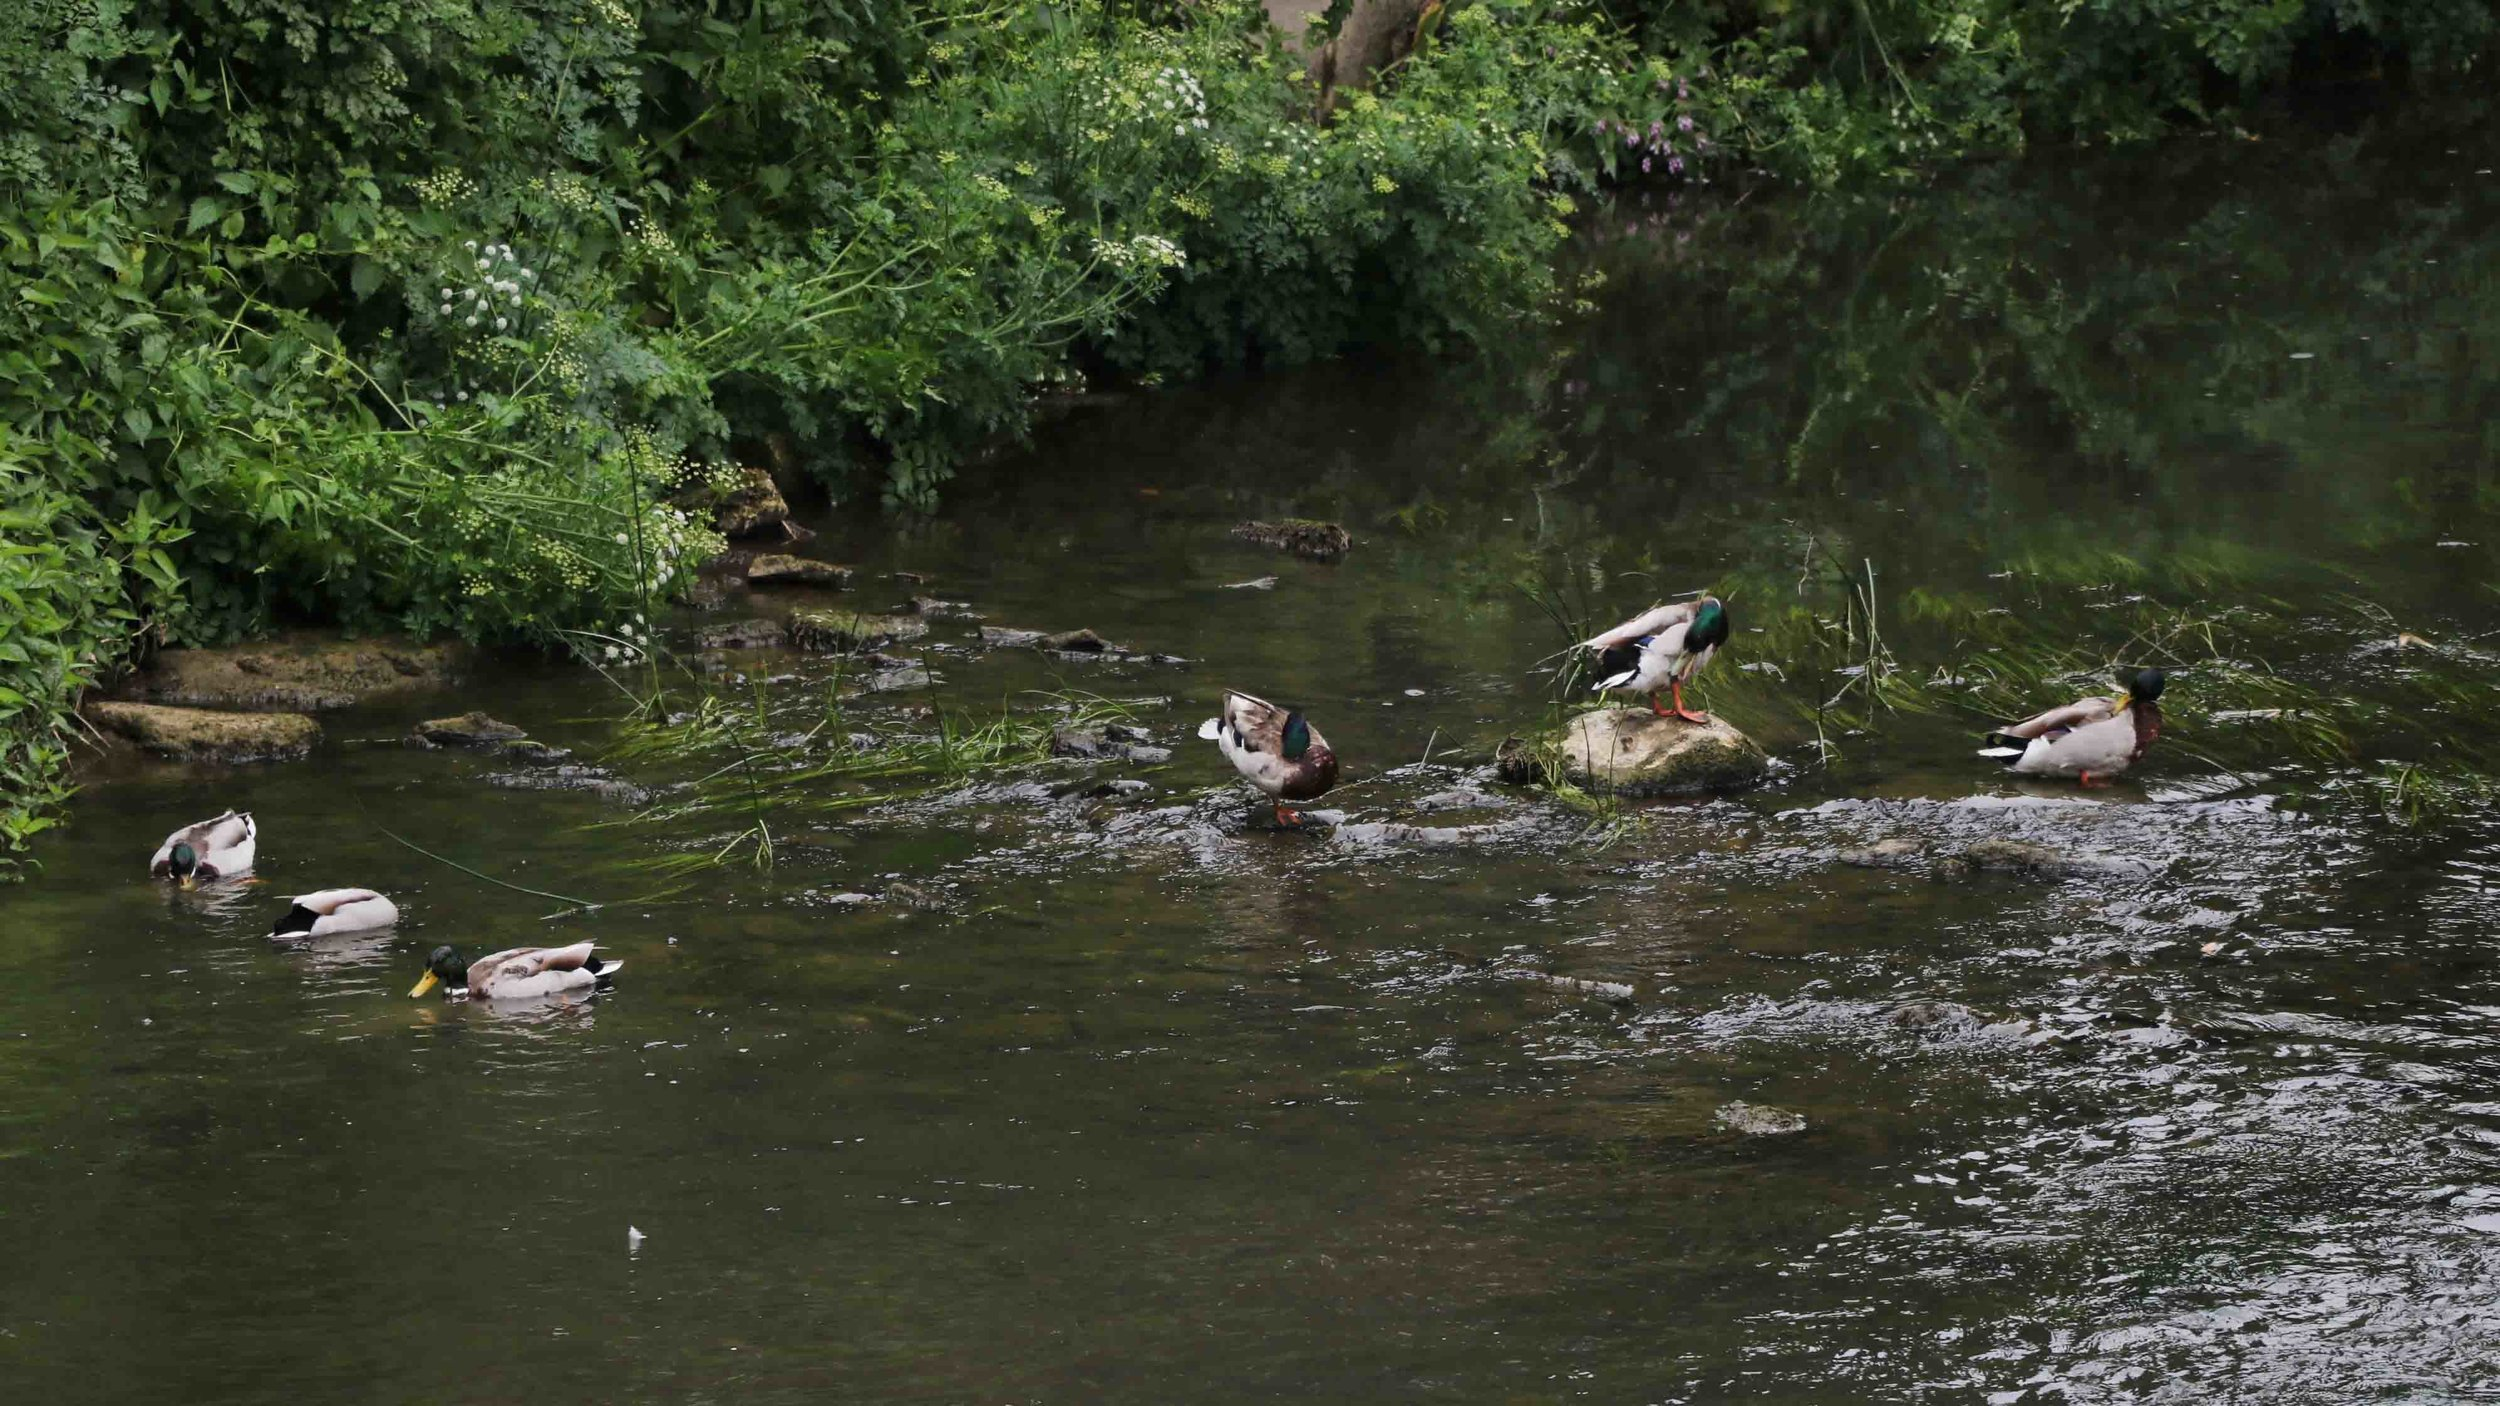 Wild ducks preening themselves.